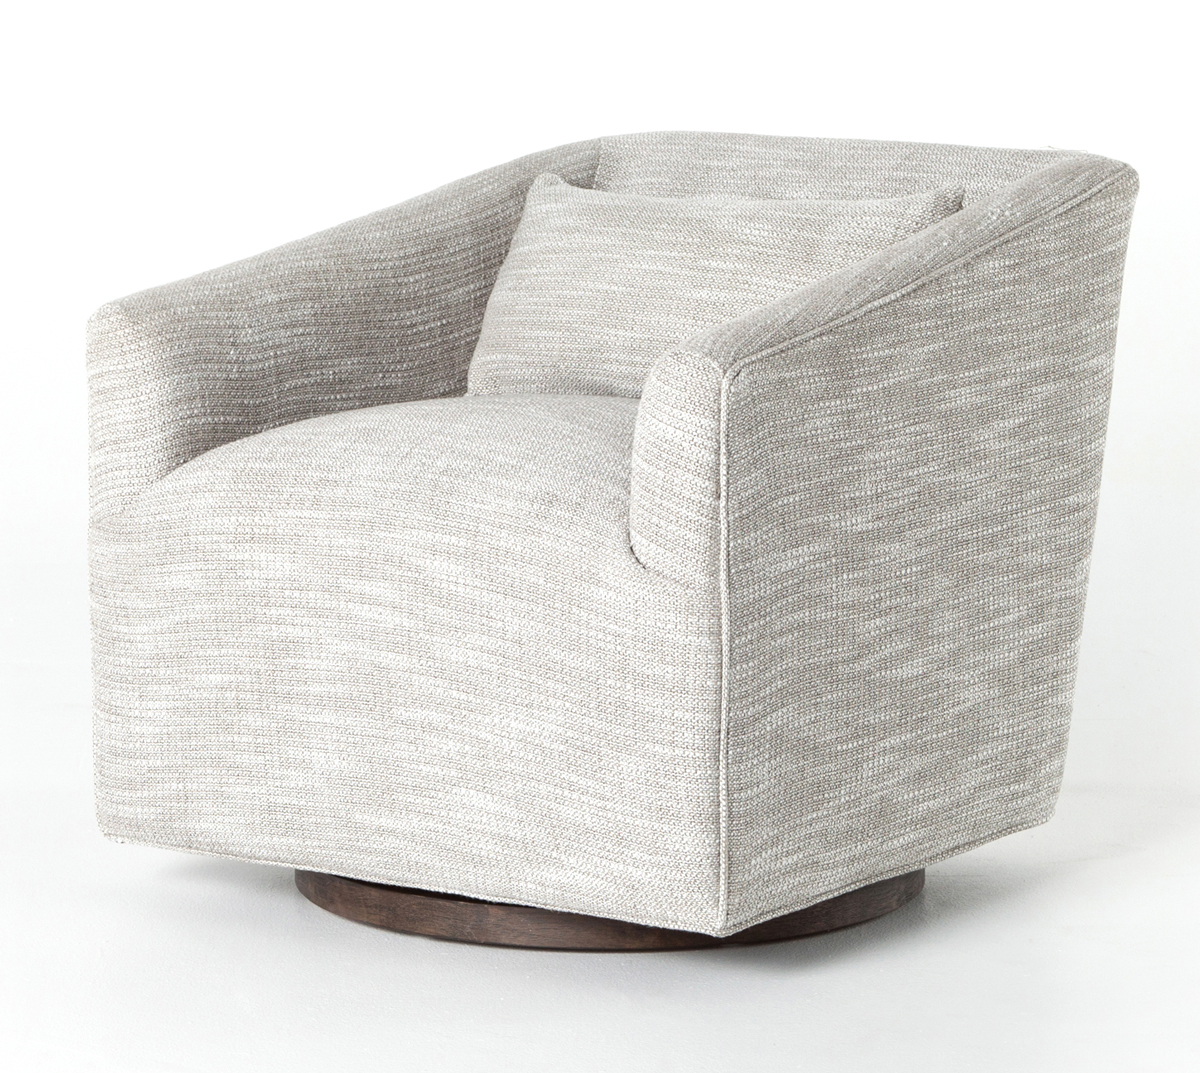 Four Hands Kensington Monterry Pebble York Swivel Chair